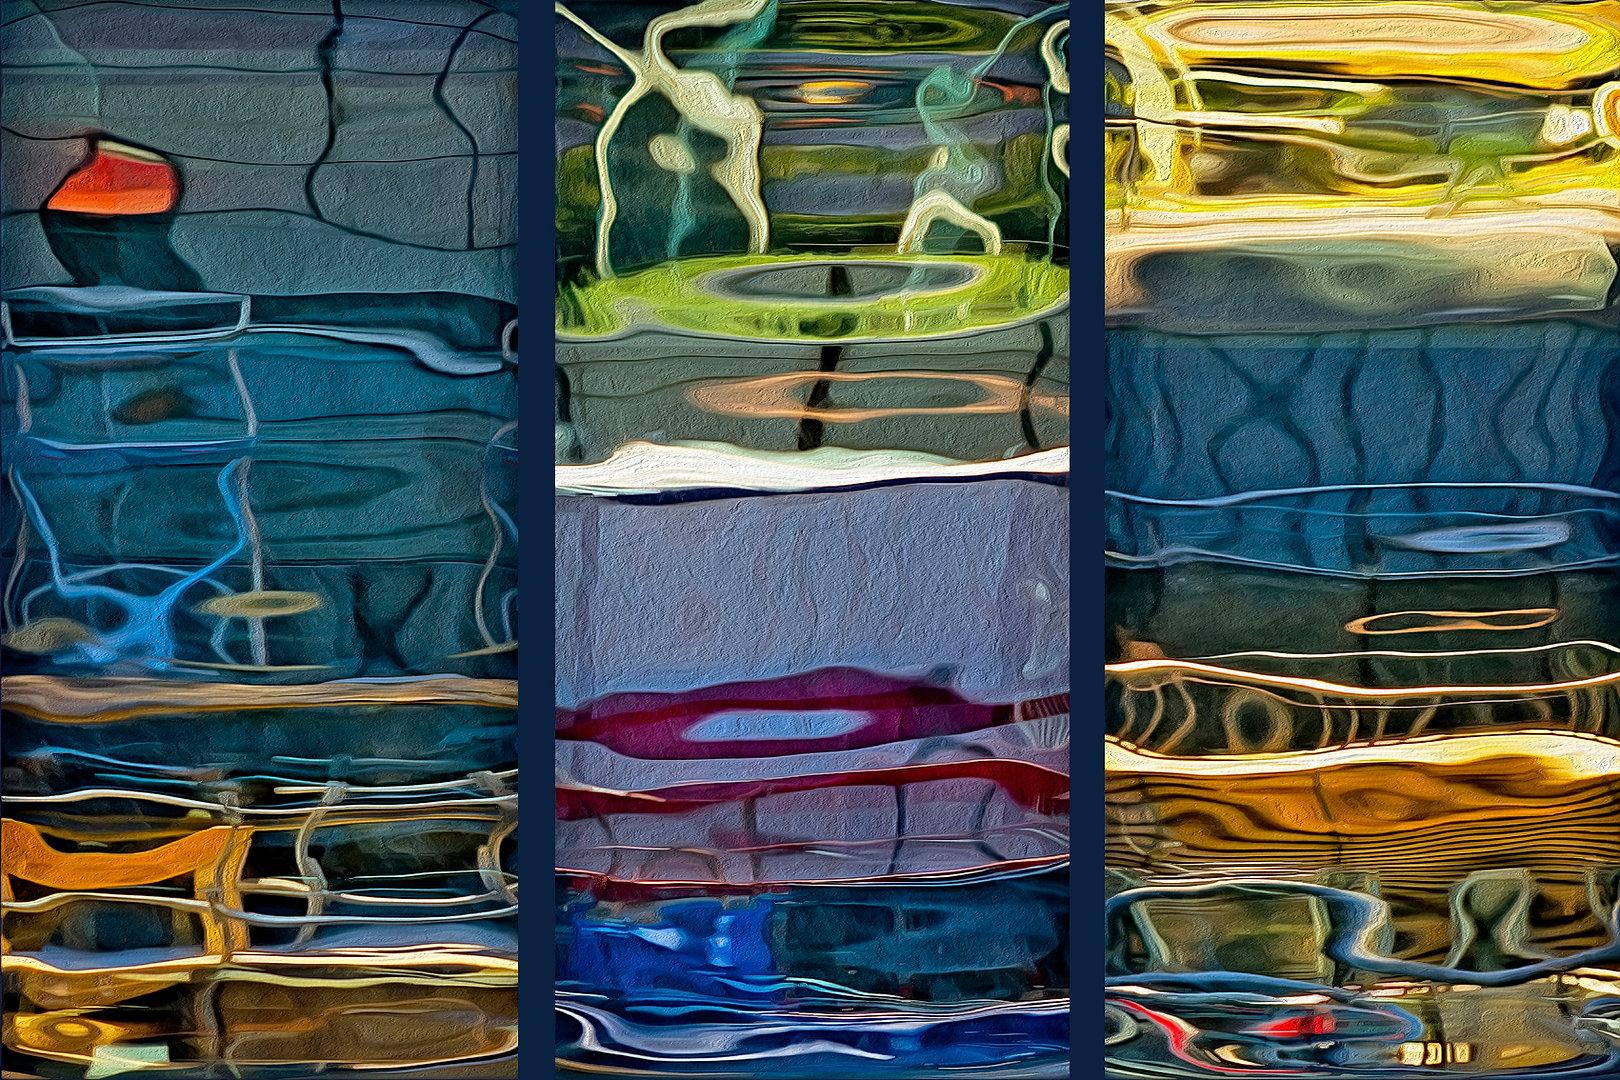 RÉFLEXION Nº 12 (triptych)  Large format fine art photograph by Denis Eugene Robert on TRAGART